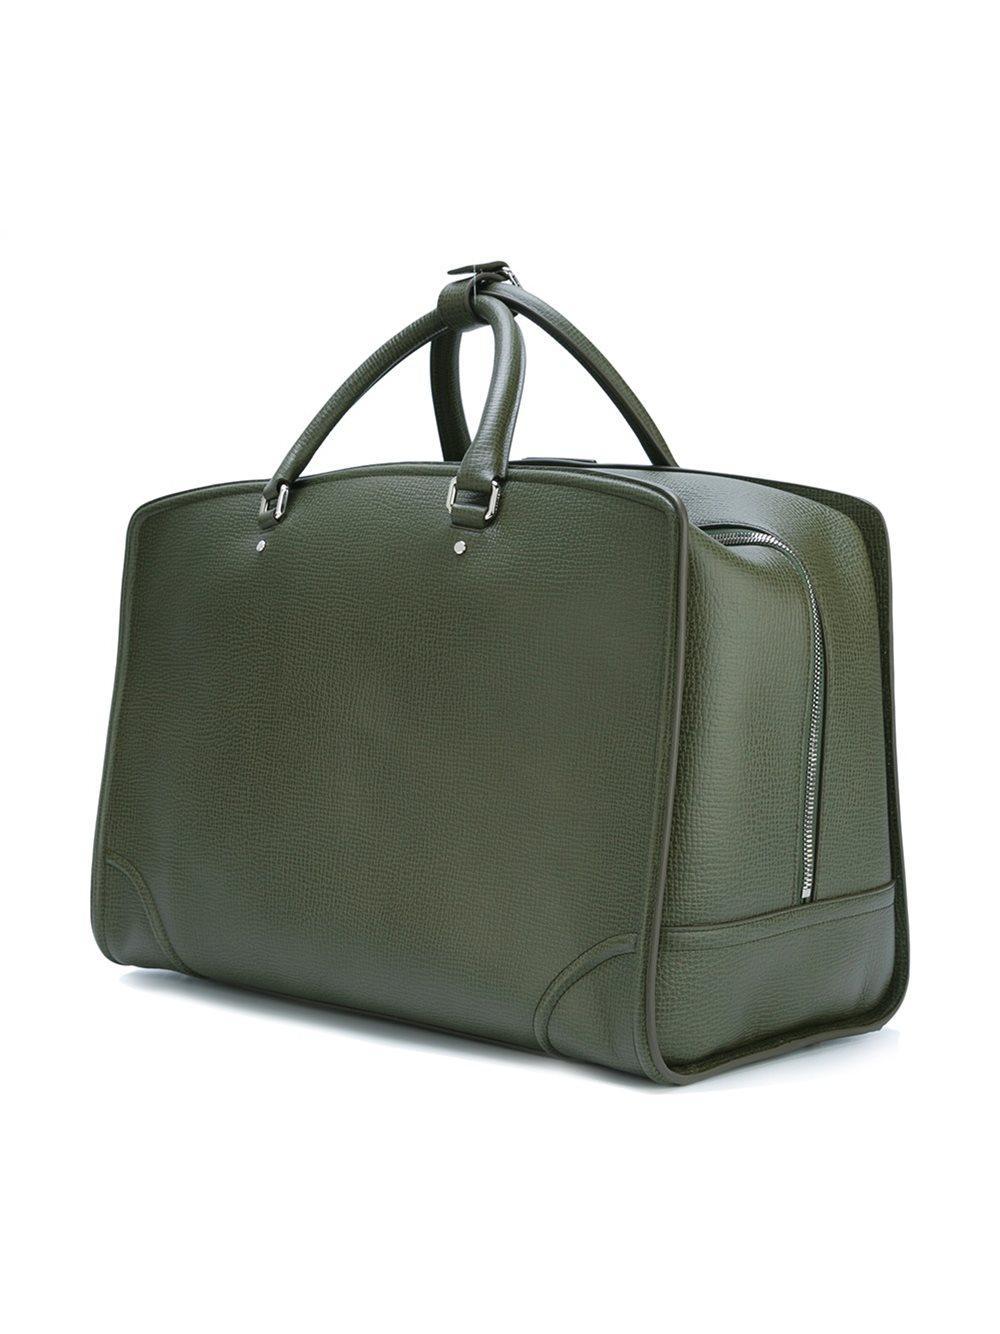 Jil Sander Weekend bag - Green bC2cV